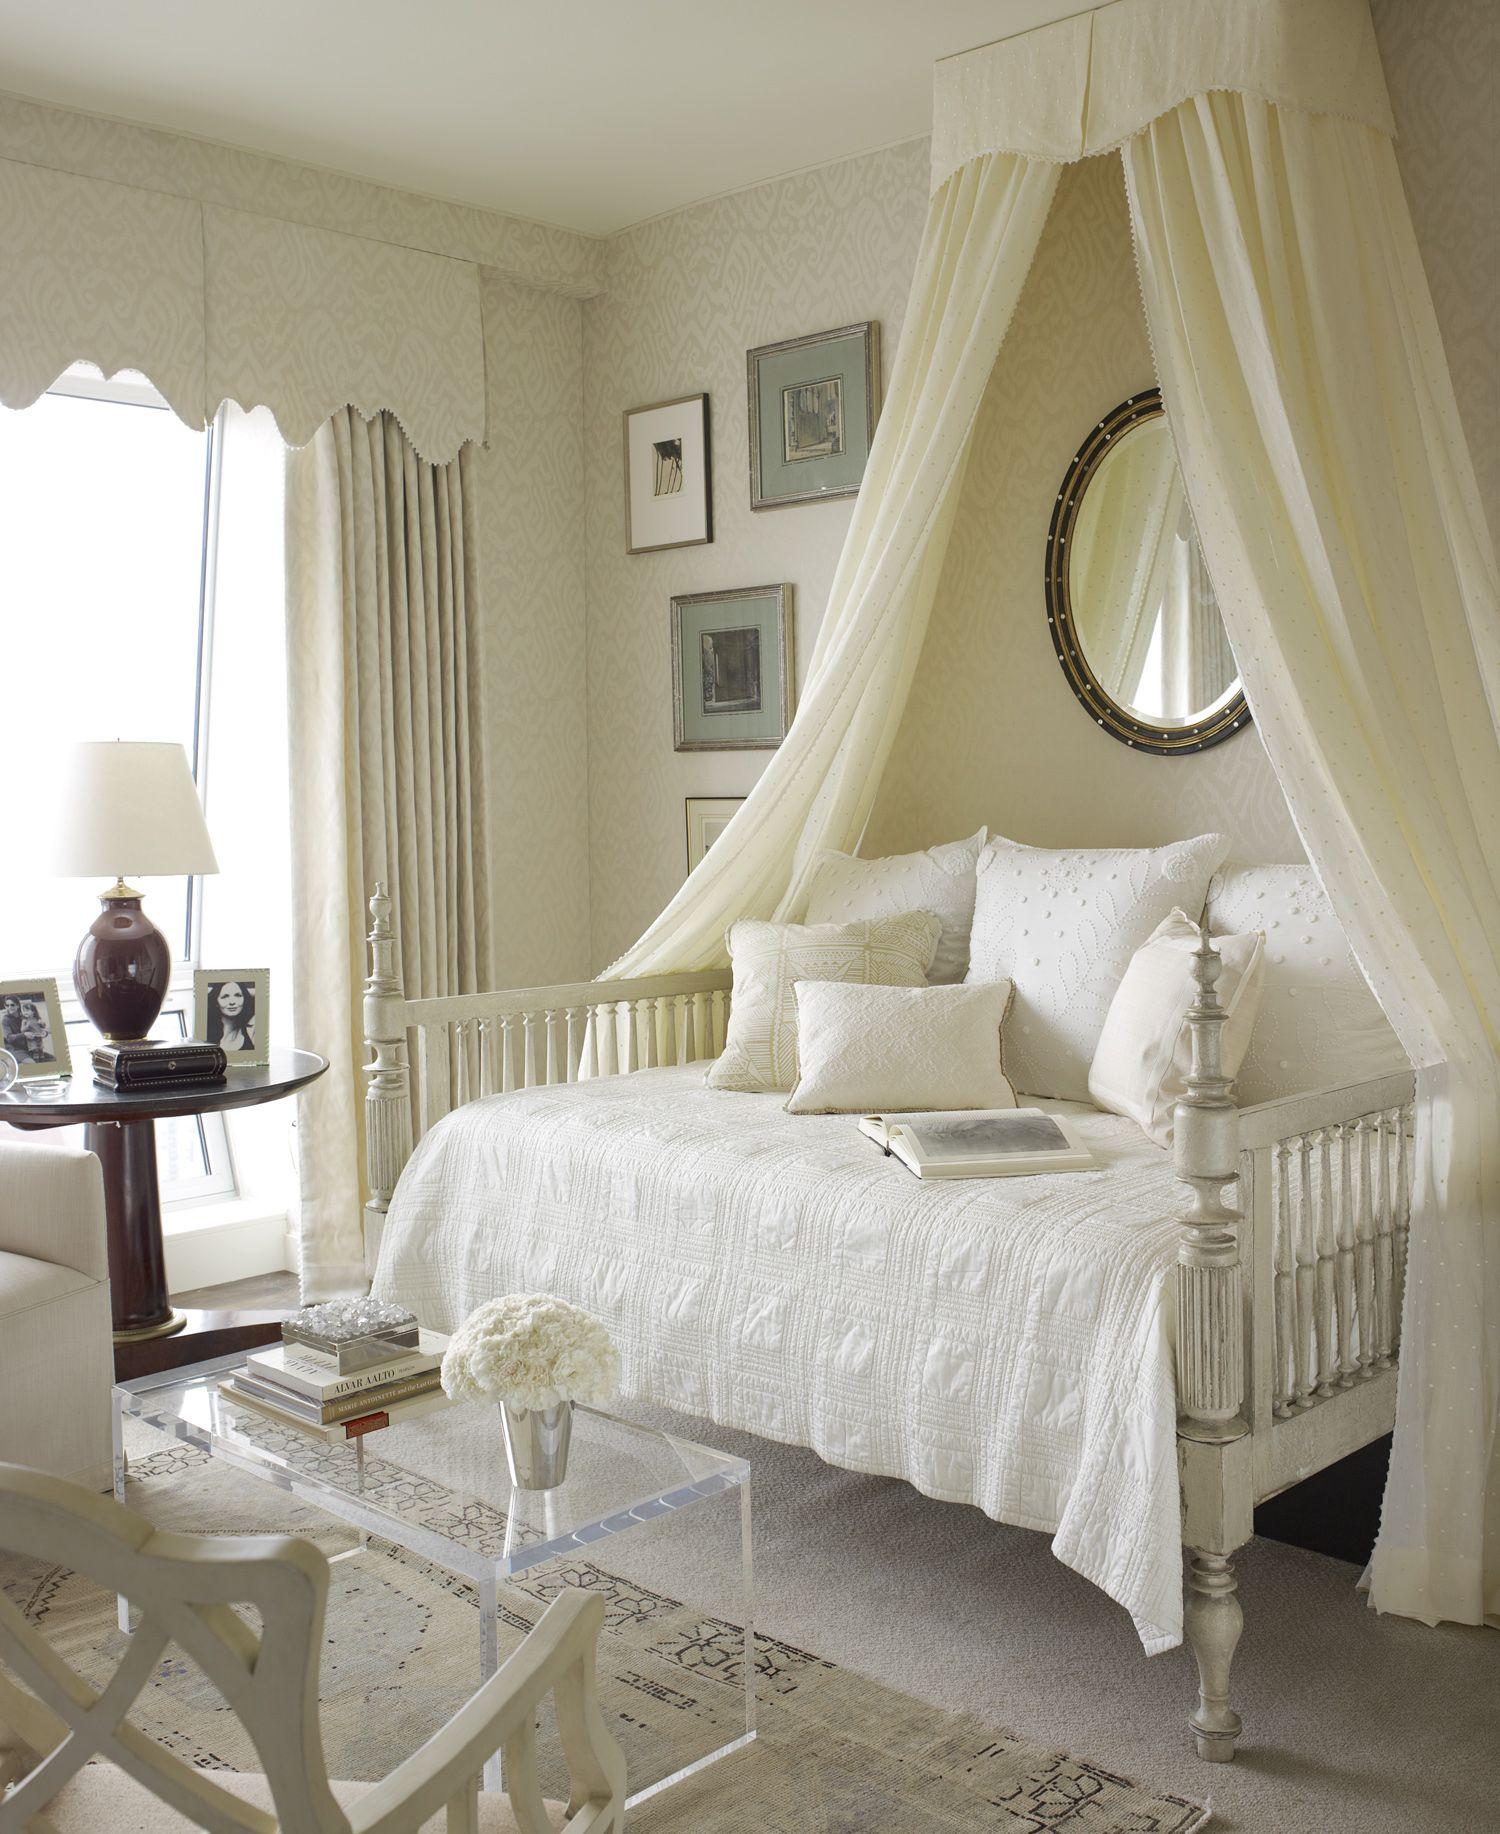 Guest Living Room Ideas Canopy Bed Diy Classic Bedroom Design